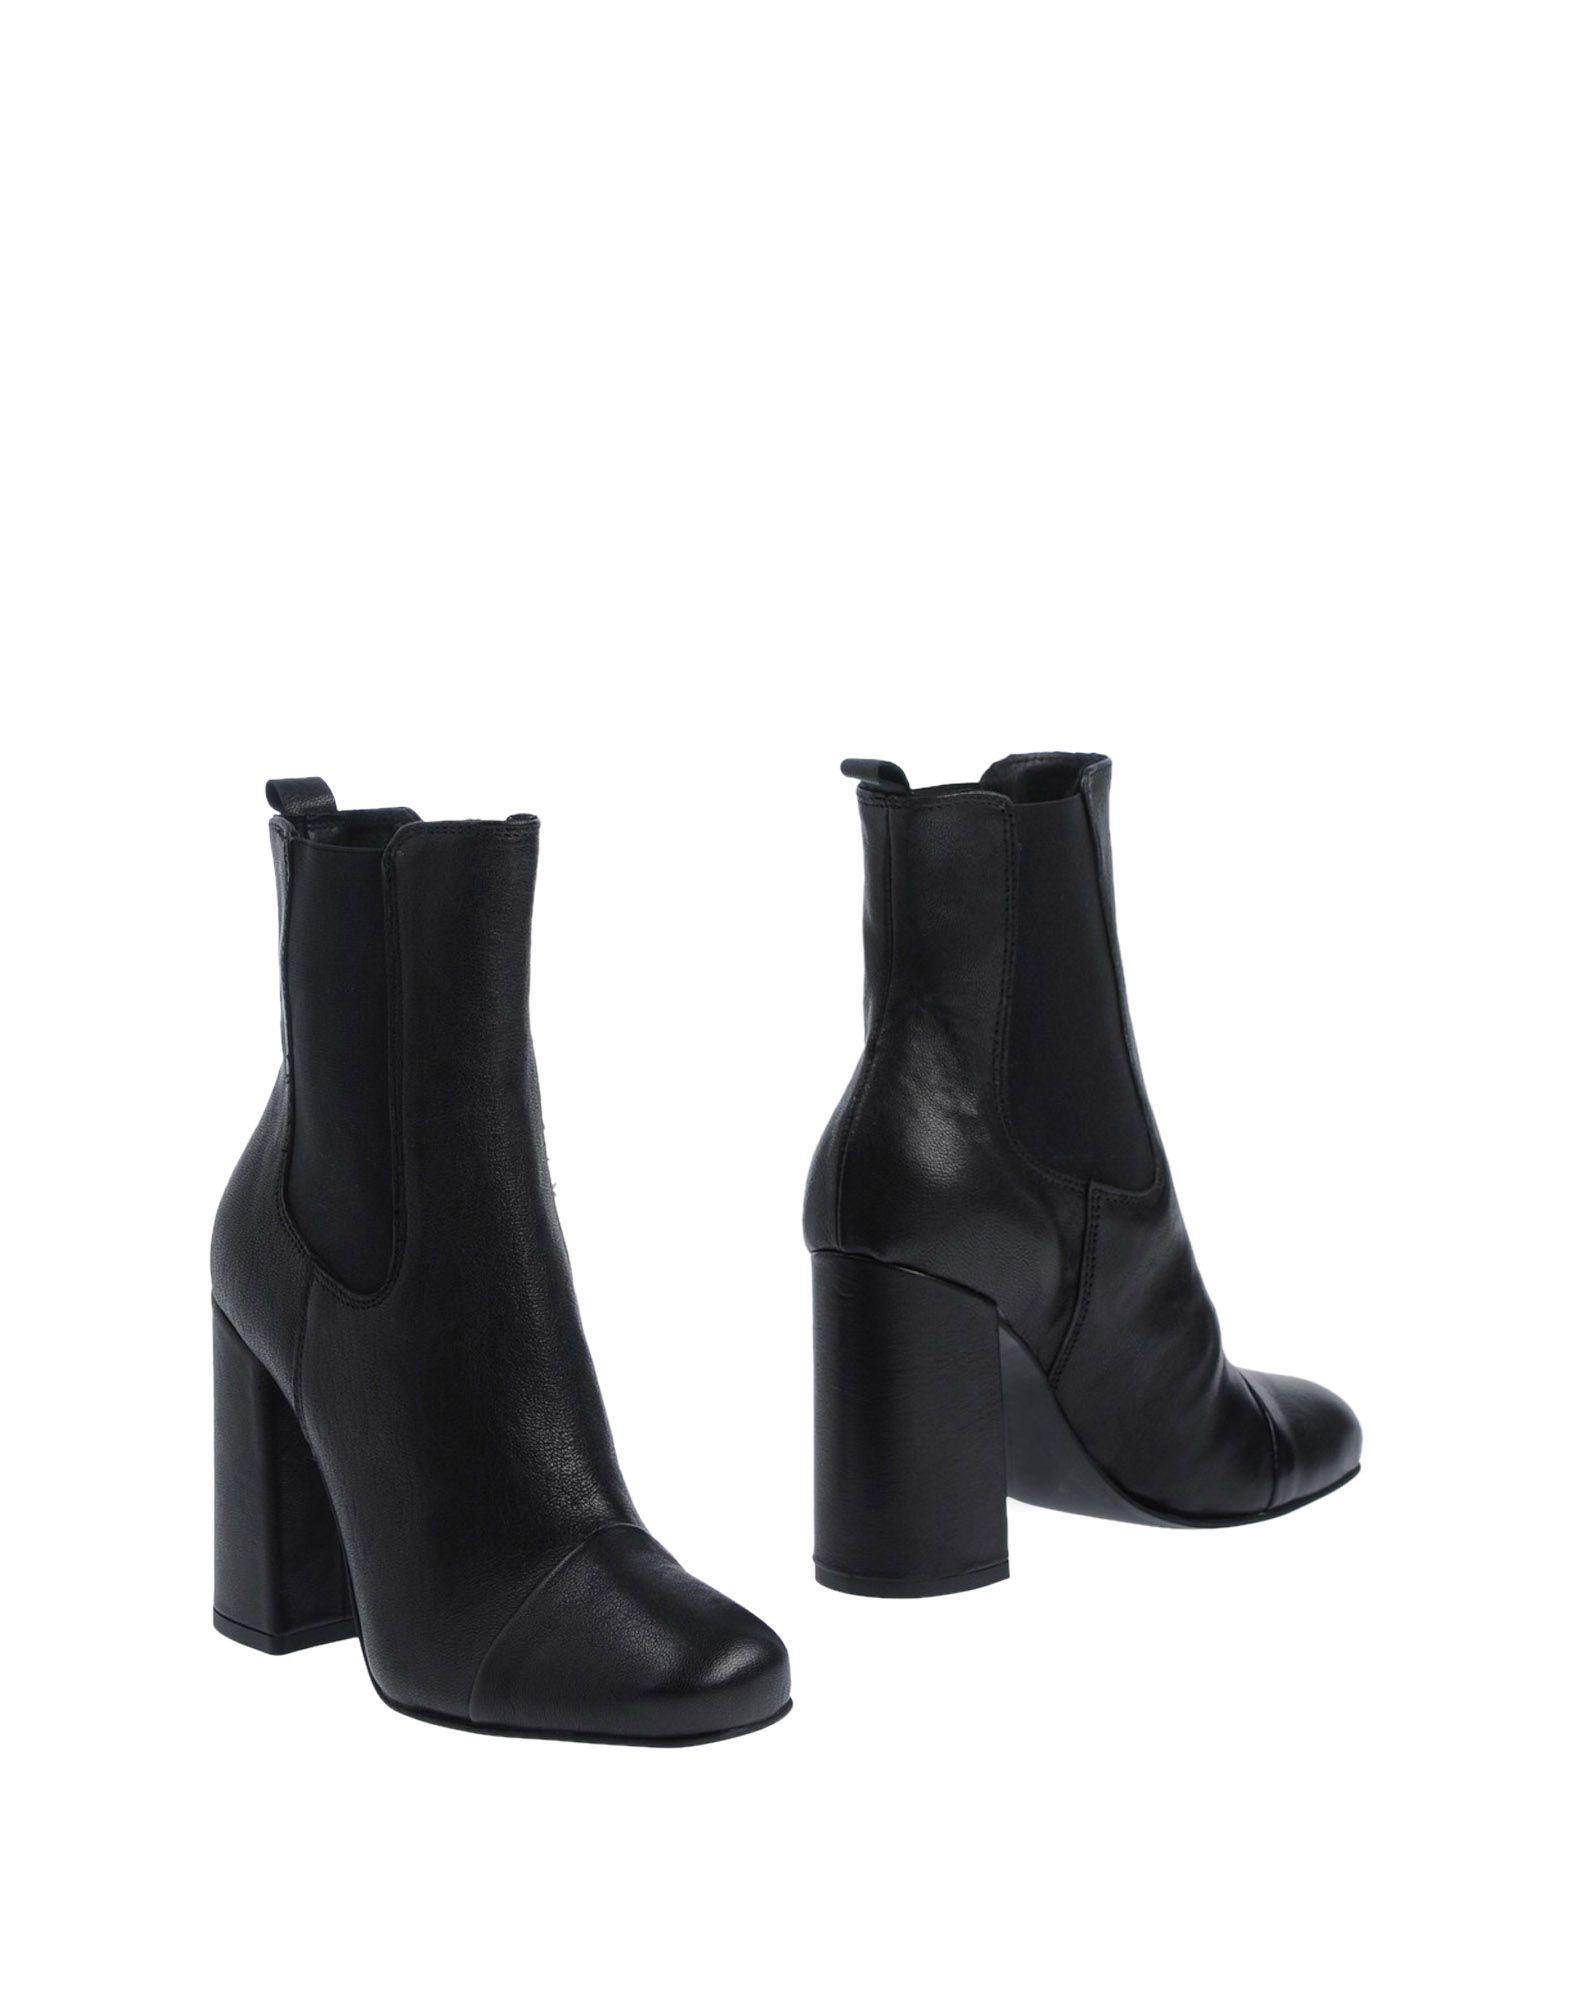 Mauro Chelsea Fedeli Chelsea Mauro Boots Damen  11507645EW Gute Qualität beliebte Schuhe 0e65dc